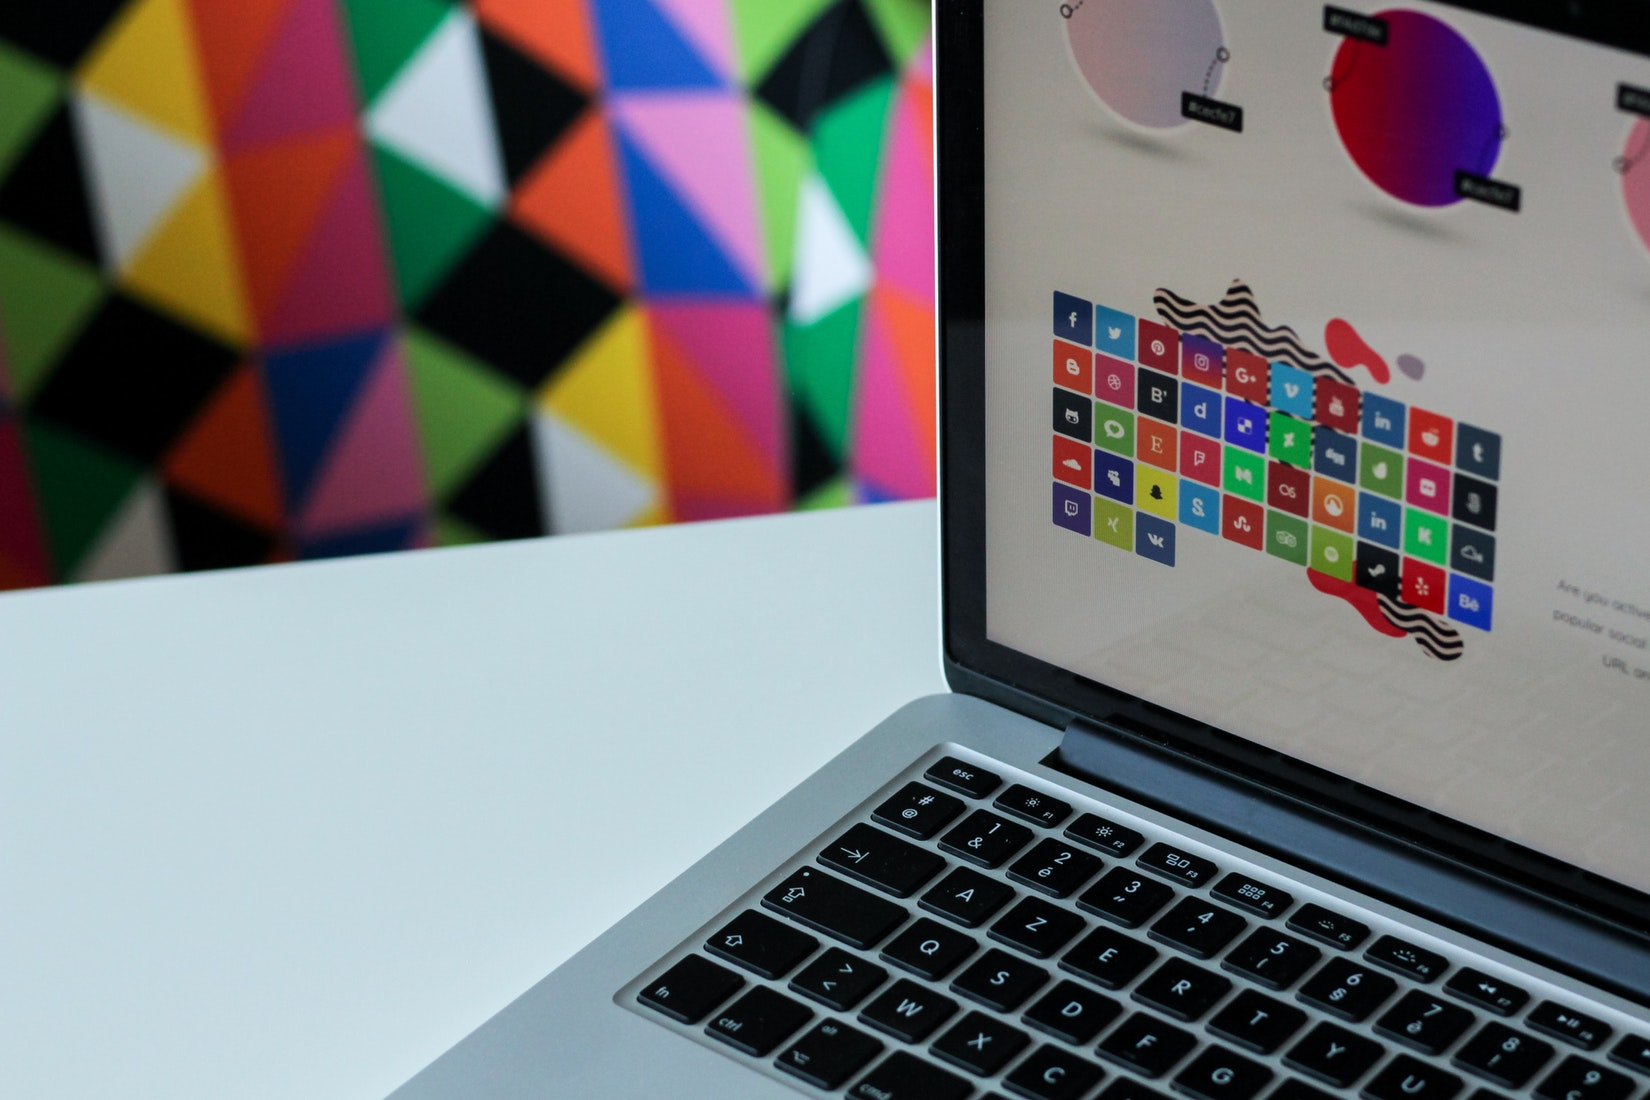 Tuyển dụng nhóm Design Freelancer mảng UX/UI